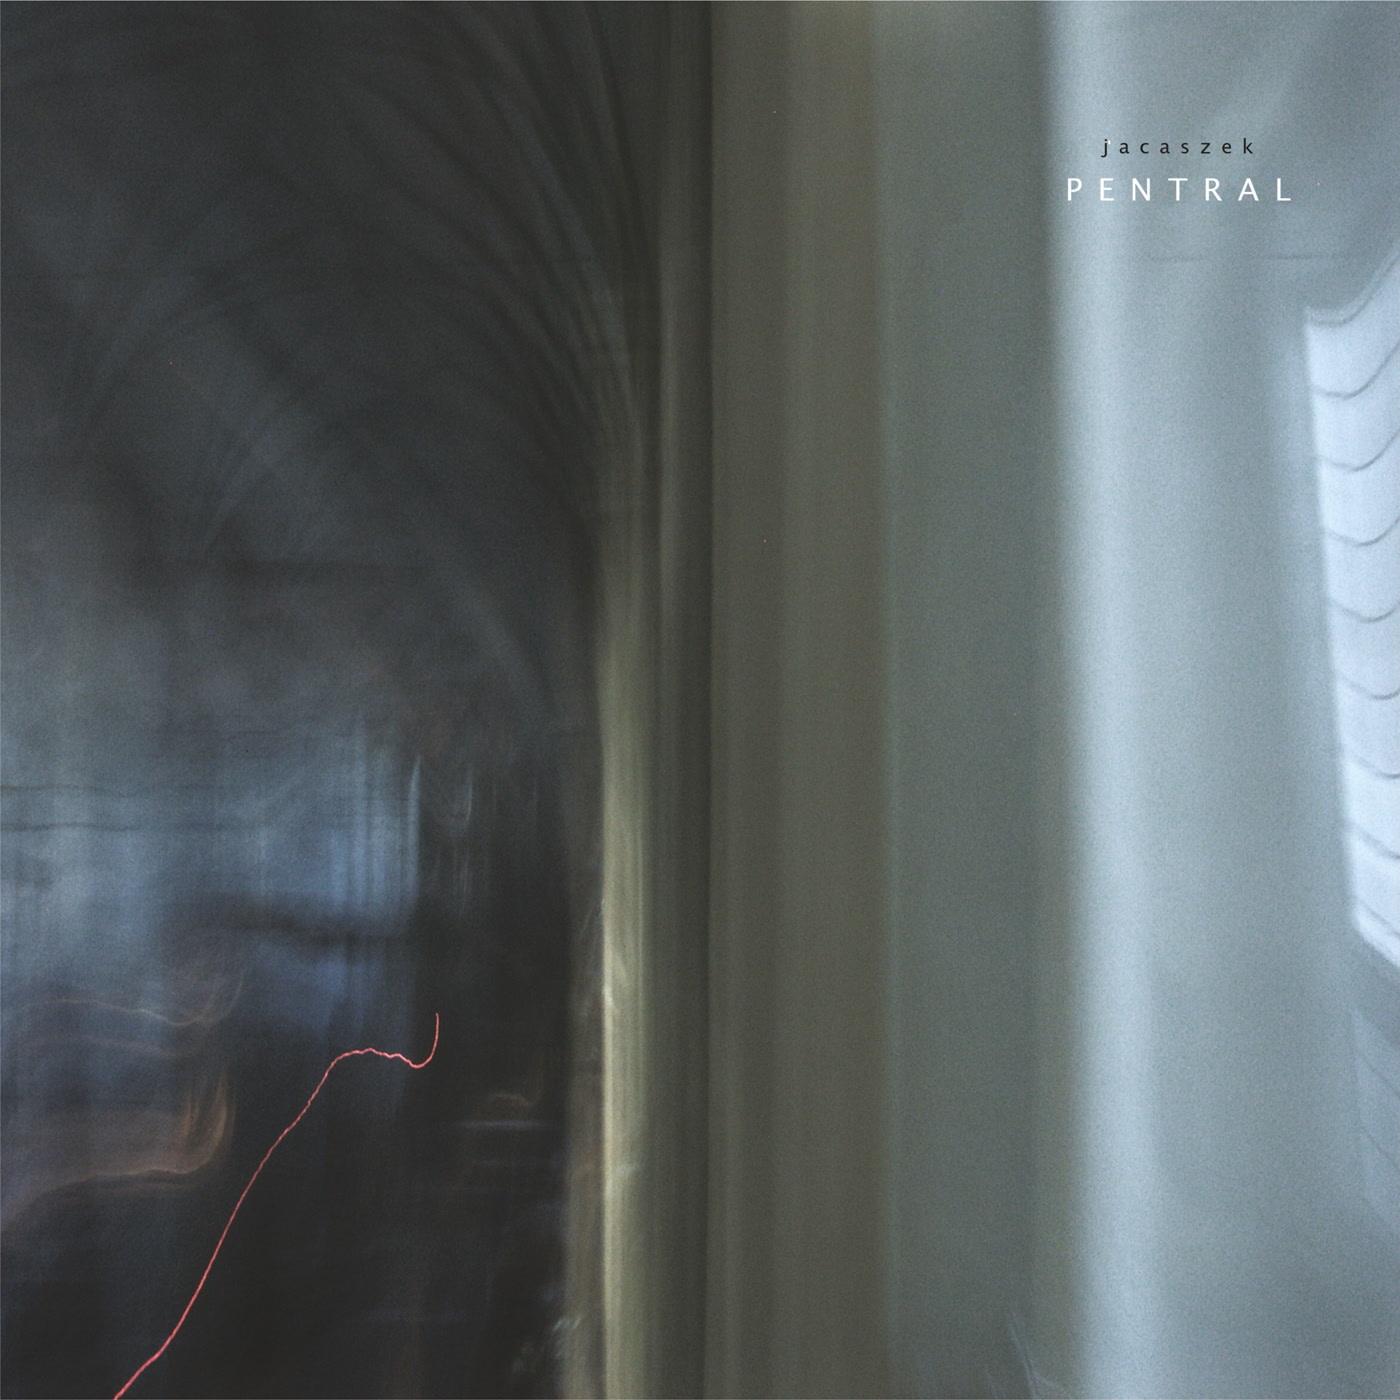 Gusstaff Records Jacaszek - Pentral